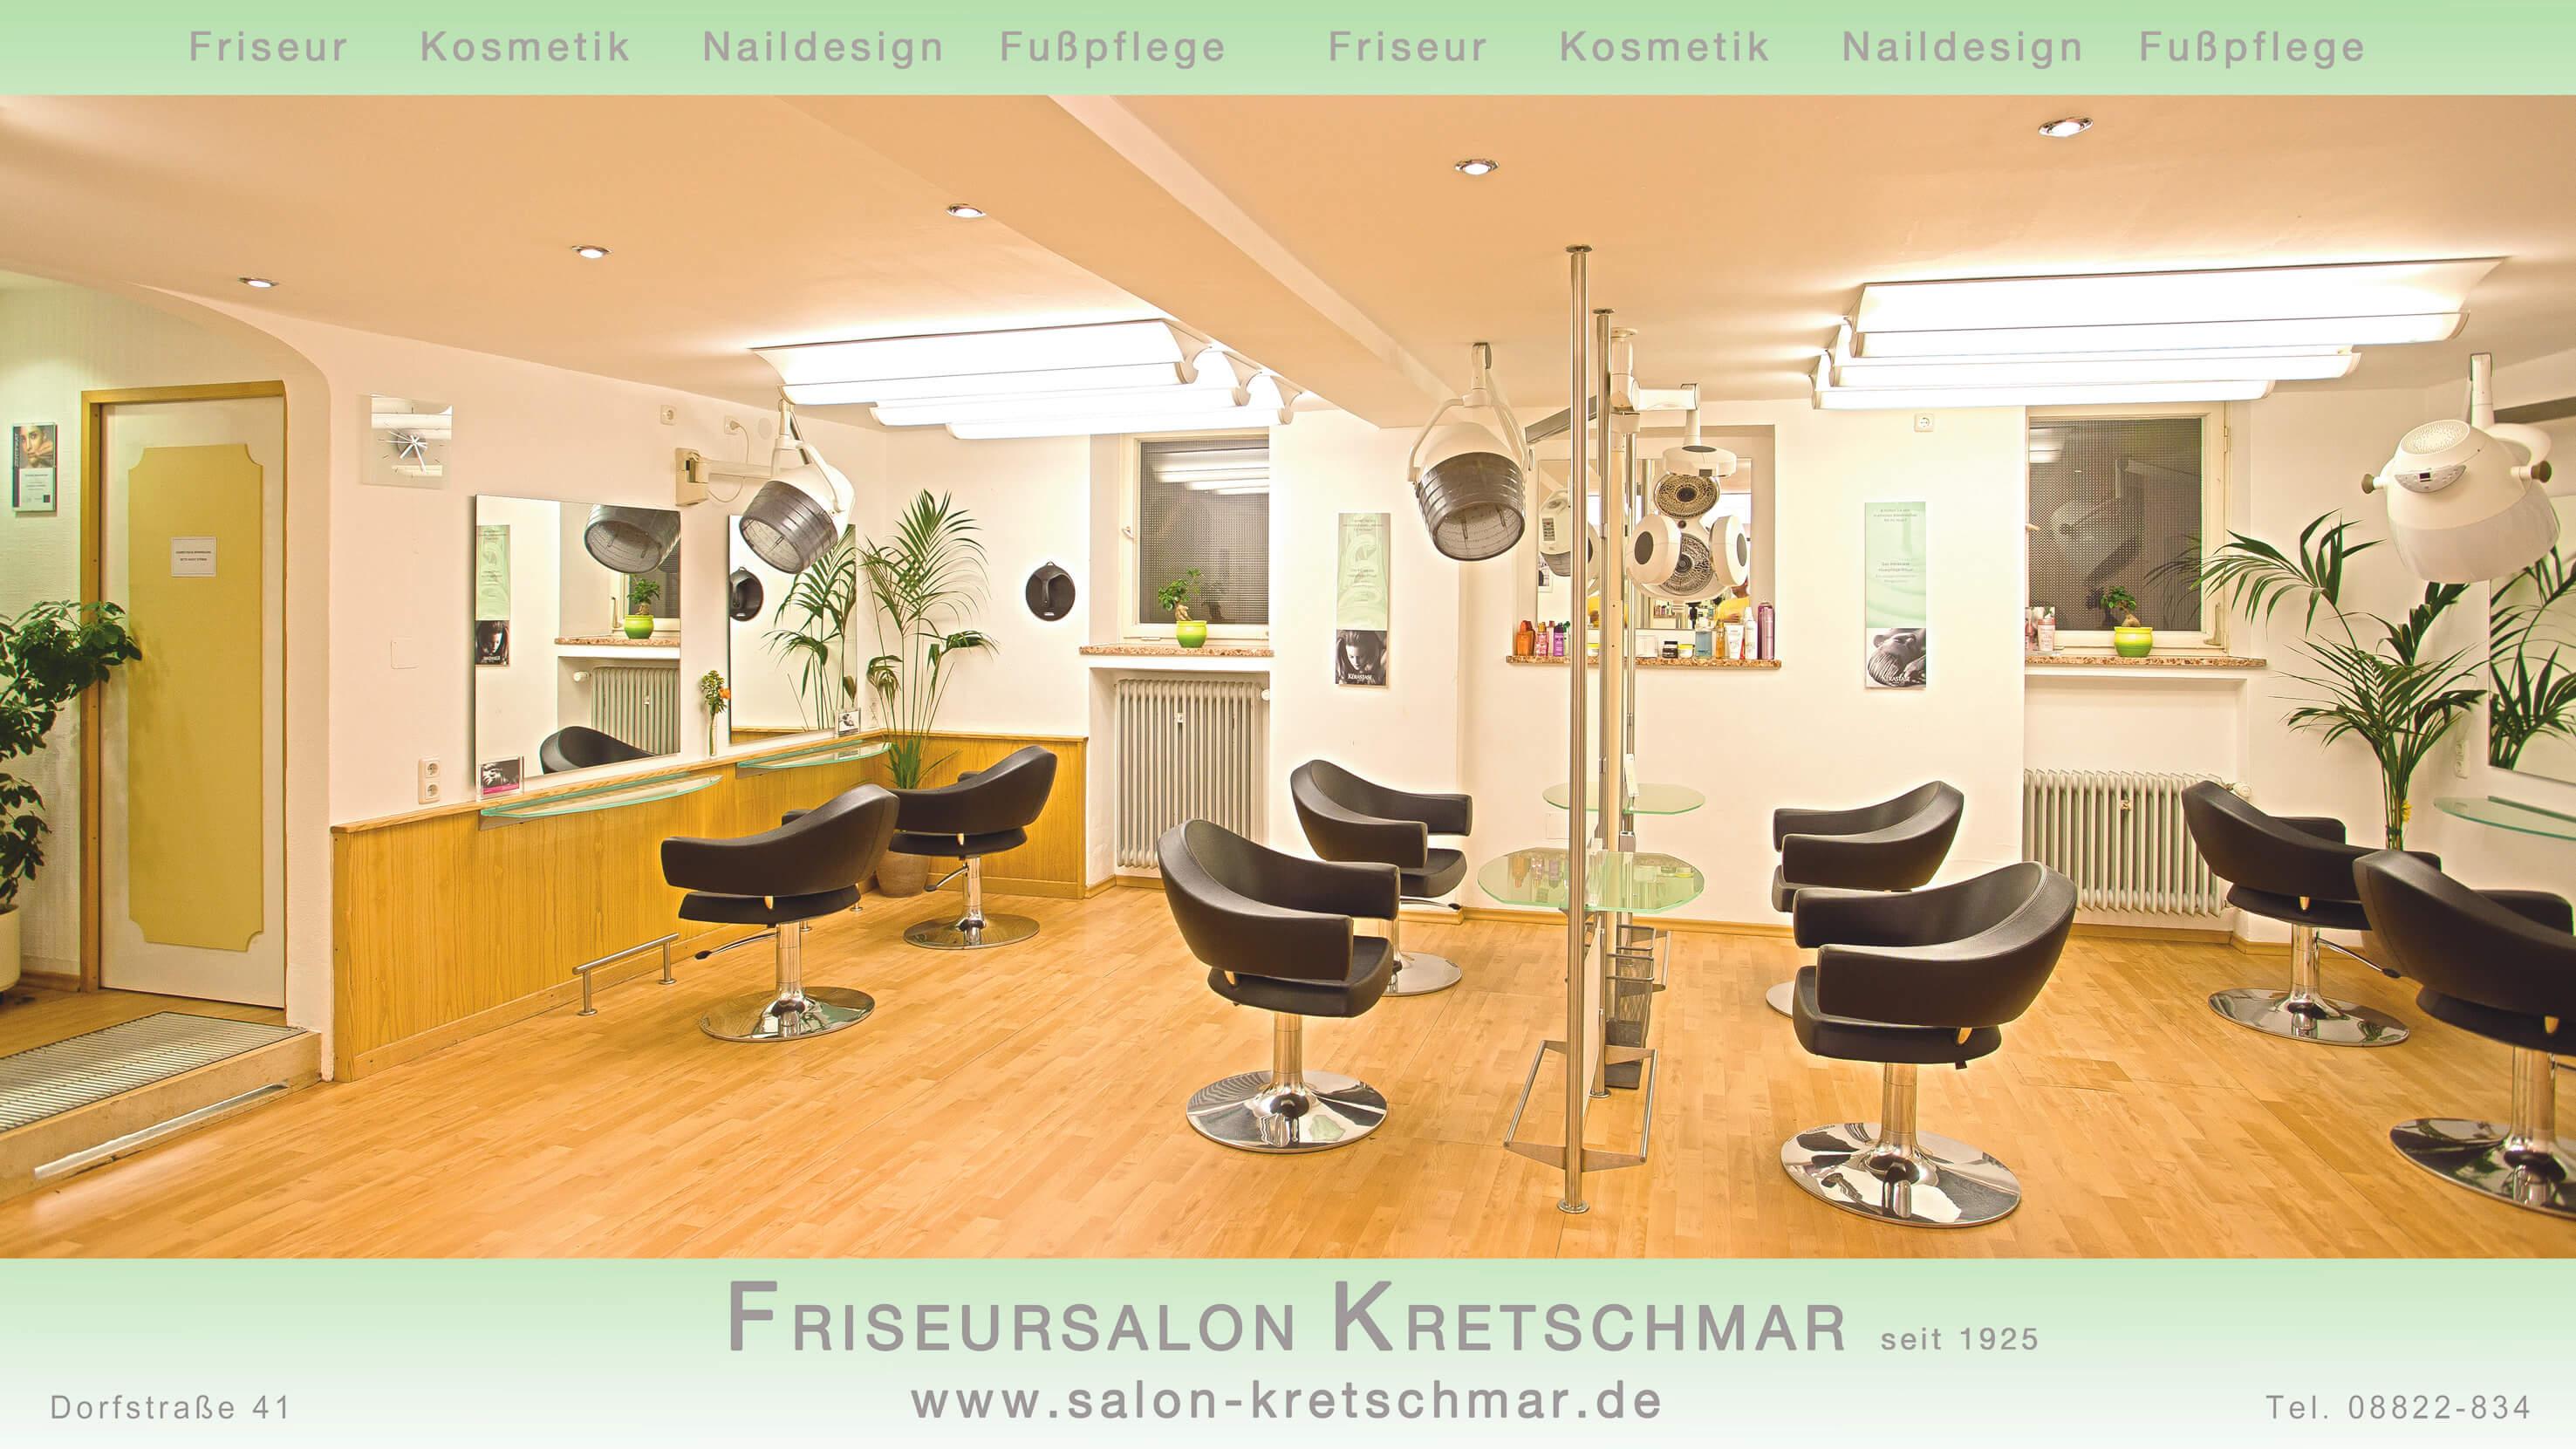 Kretschmar Salon